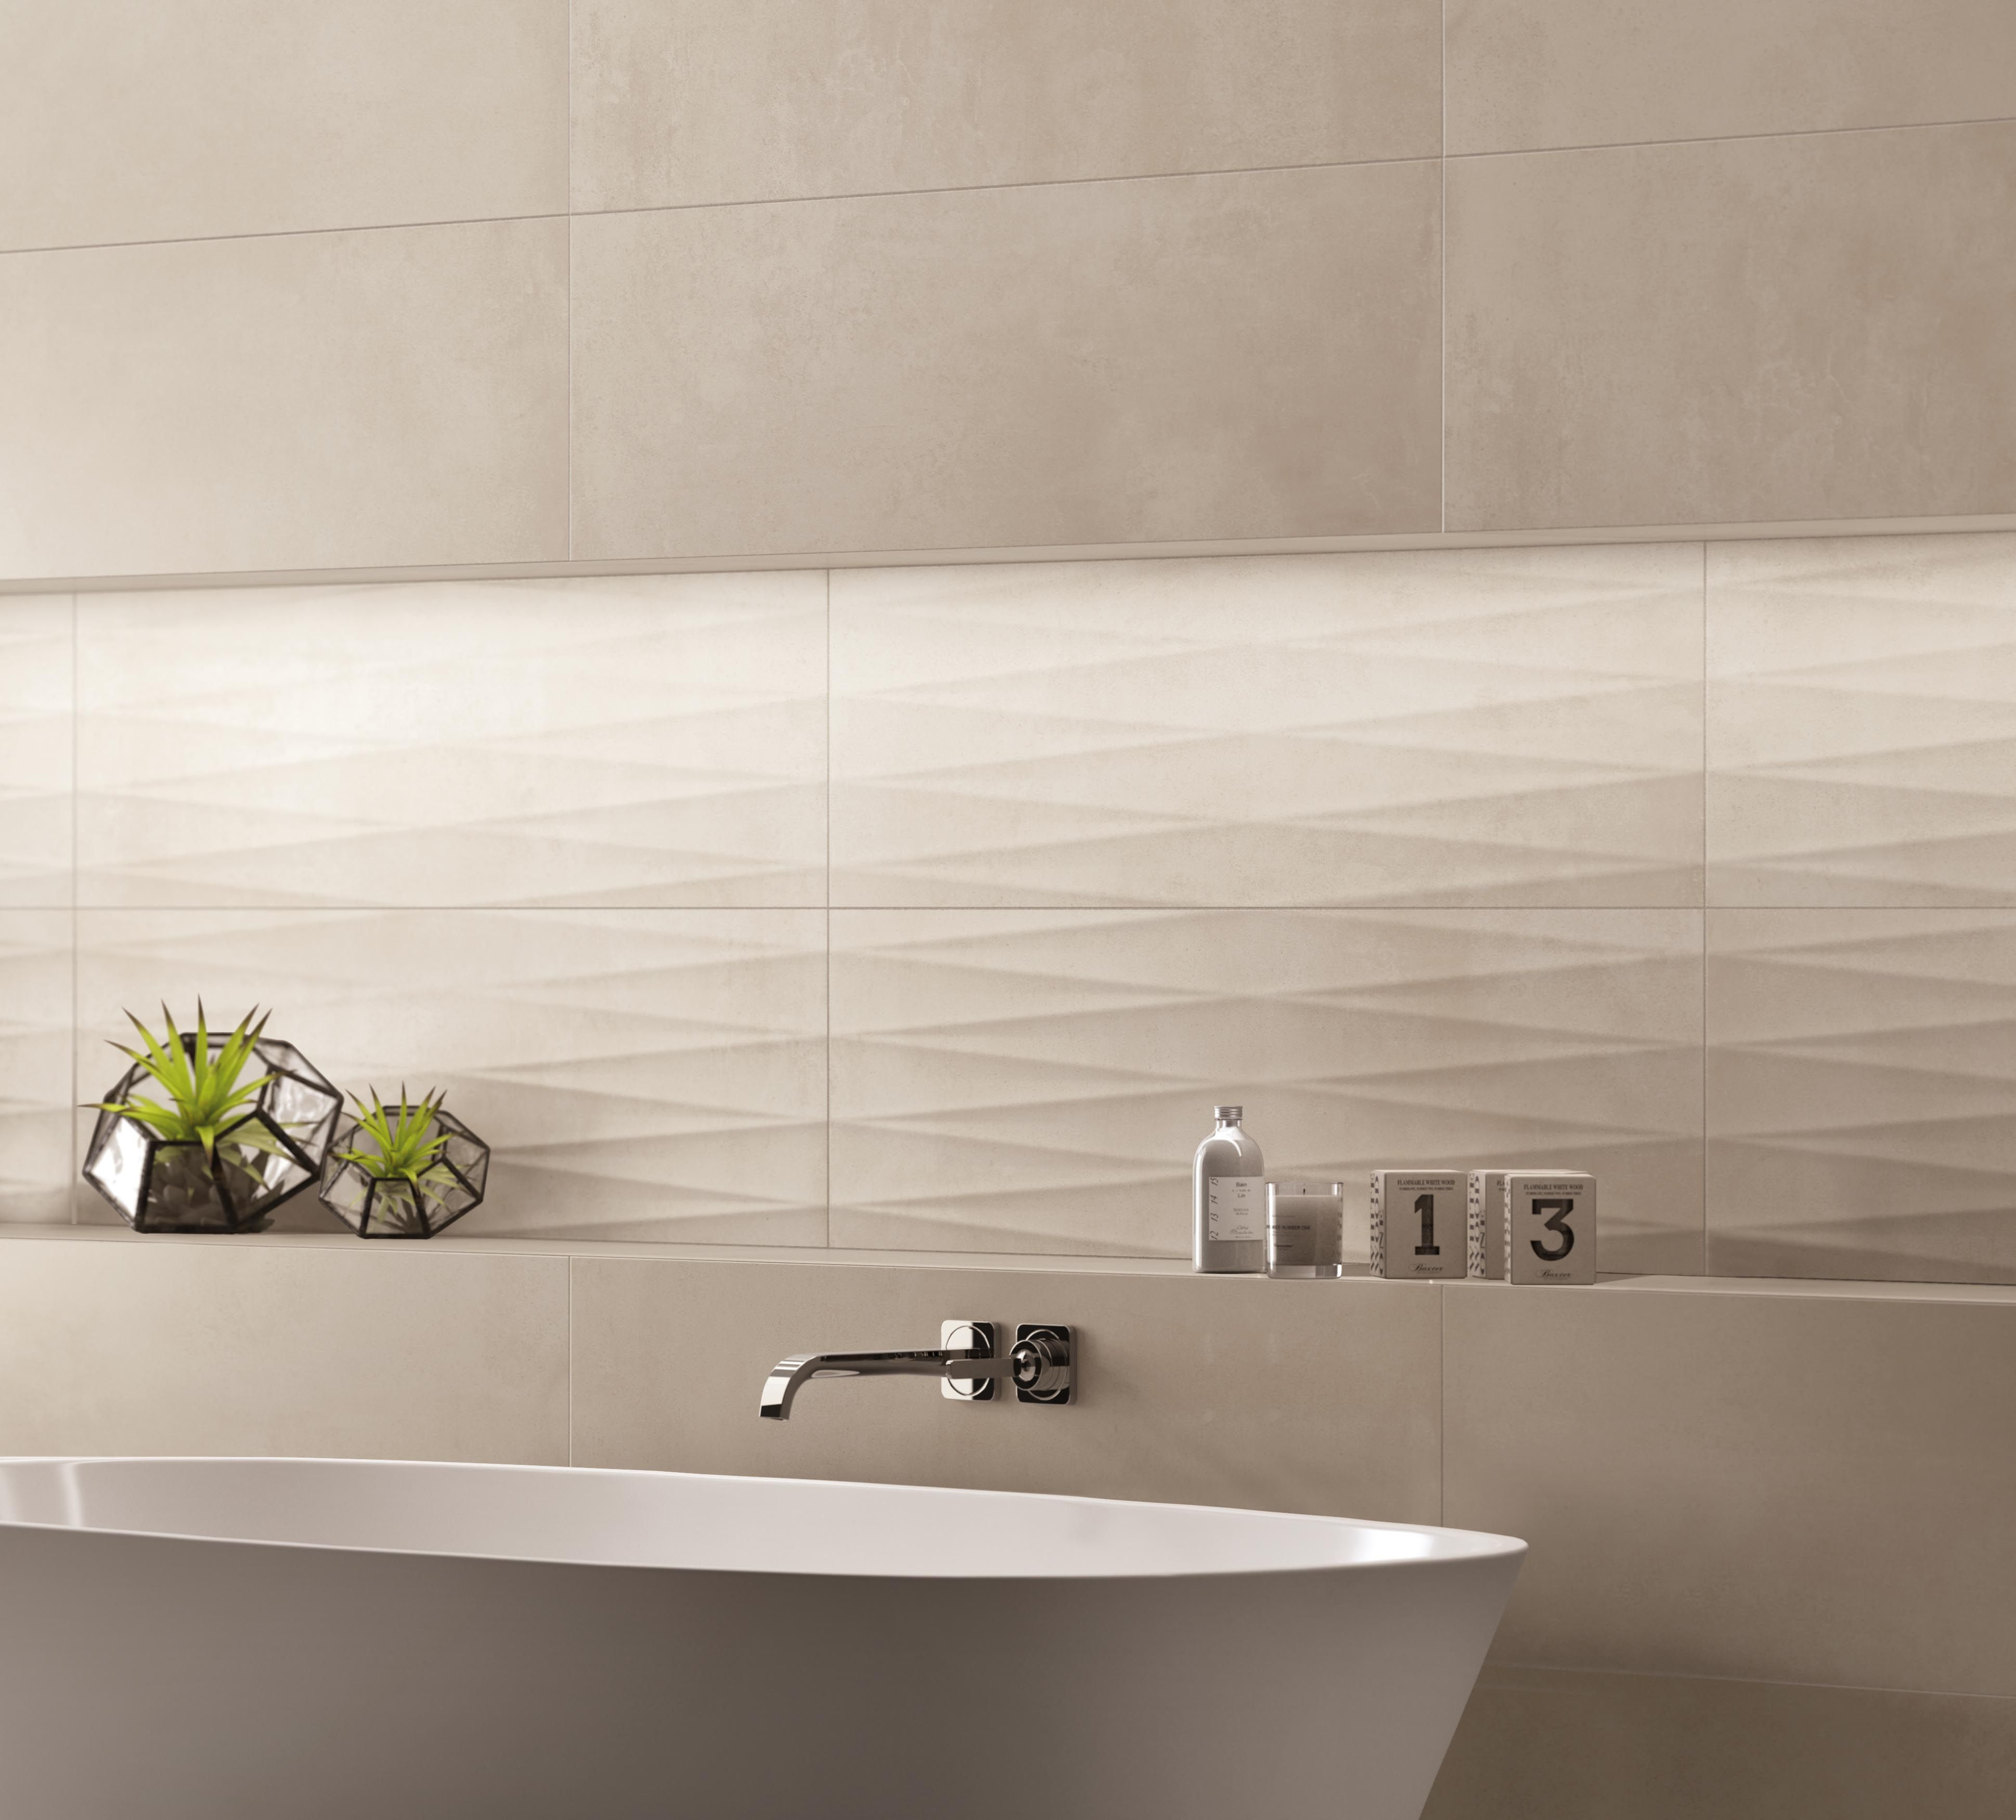 basteln mit fliesen fabulous fliesen mosaik reste basteln. Black Bedroom Furniture Sets. Home Design Ideas